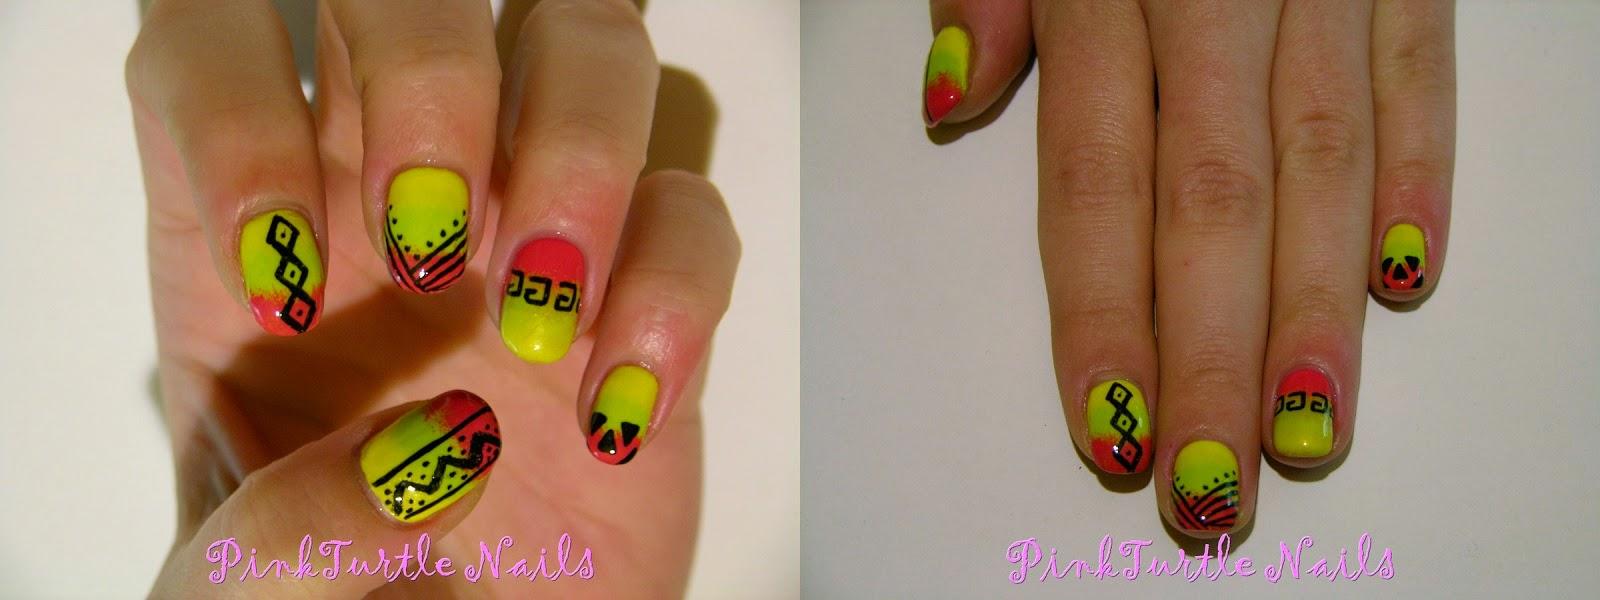 http://pinkturtlenails.blogspot.com.es/2015/03/reto-31-dias-tribal.html